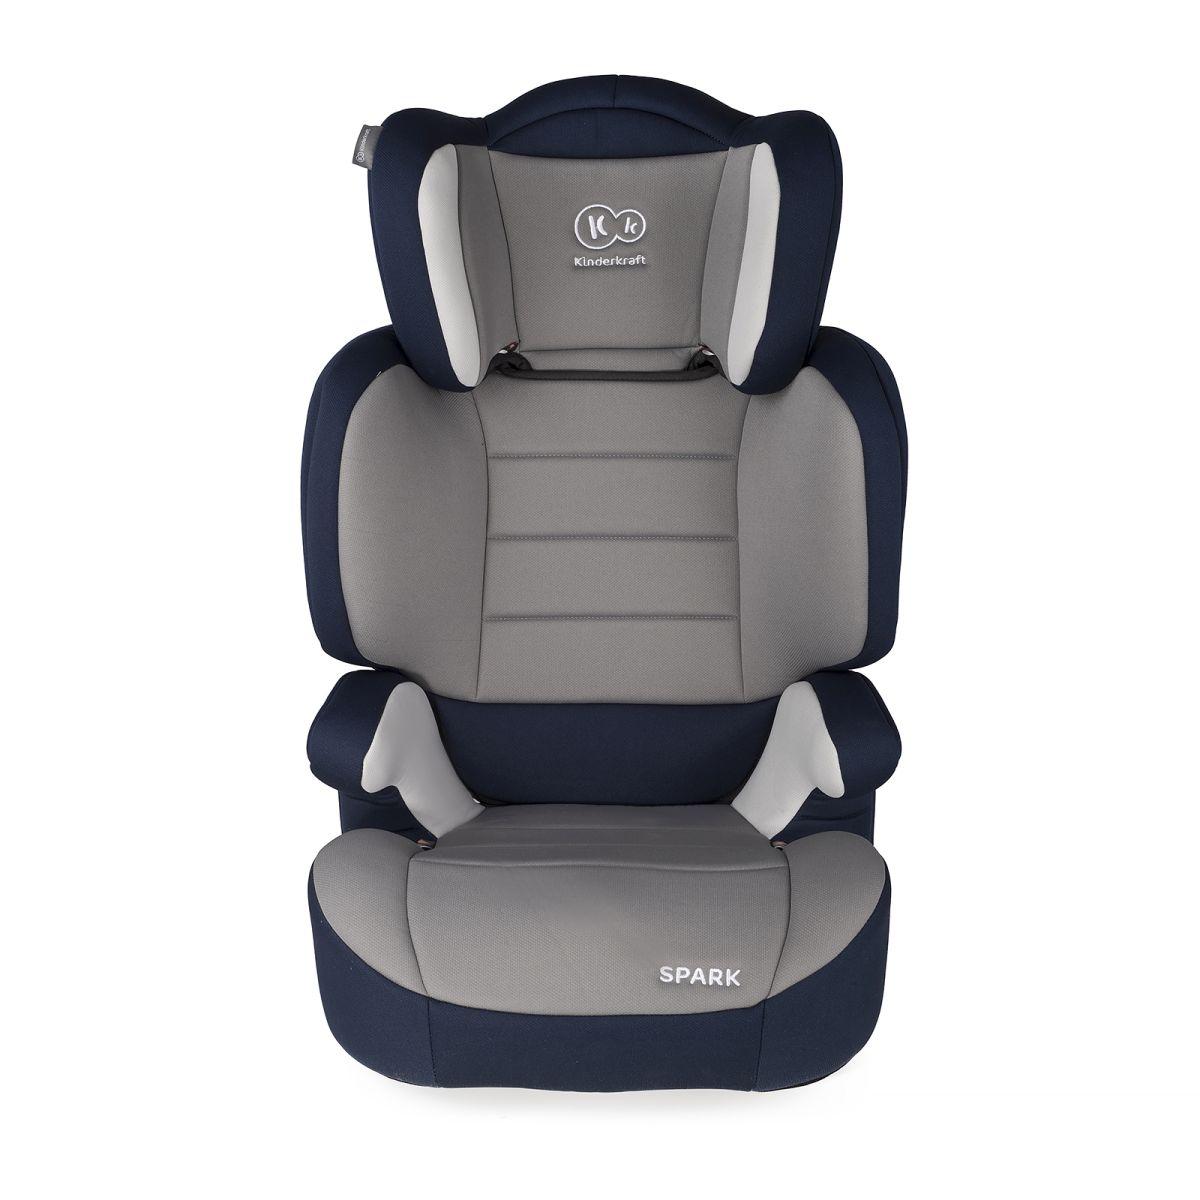 Kinderkraft spark up si ge voiture pour b b chaise enfant for Chaise kinderkraft